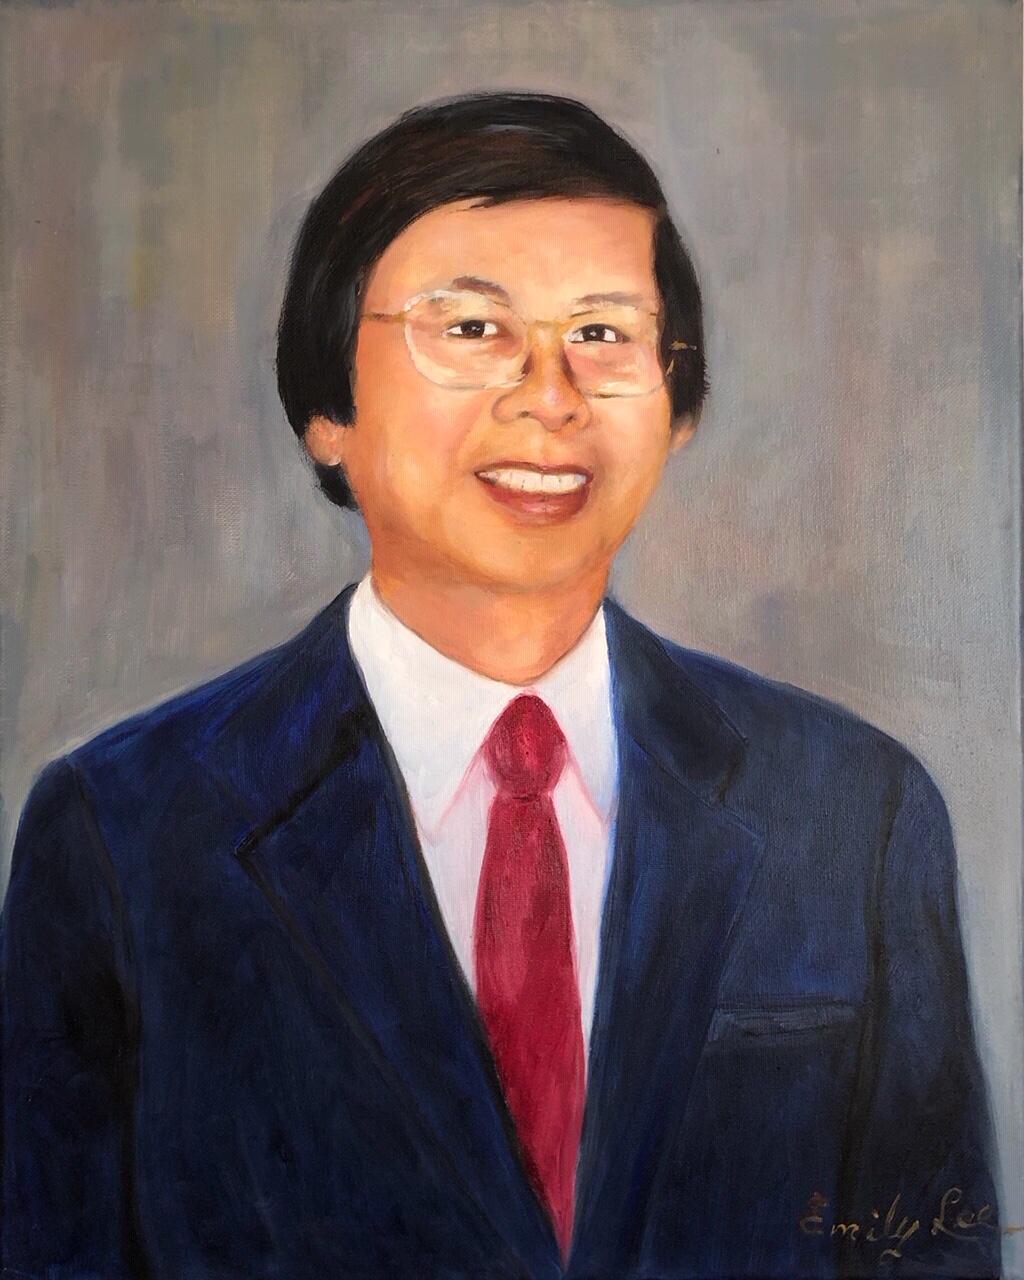 32.  Dr. Ching-Tse Lee 李清澤博士 by Artist 林榮峰 Emily Lee/09/2020